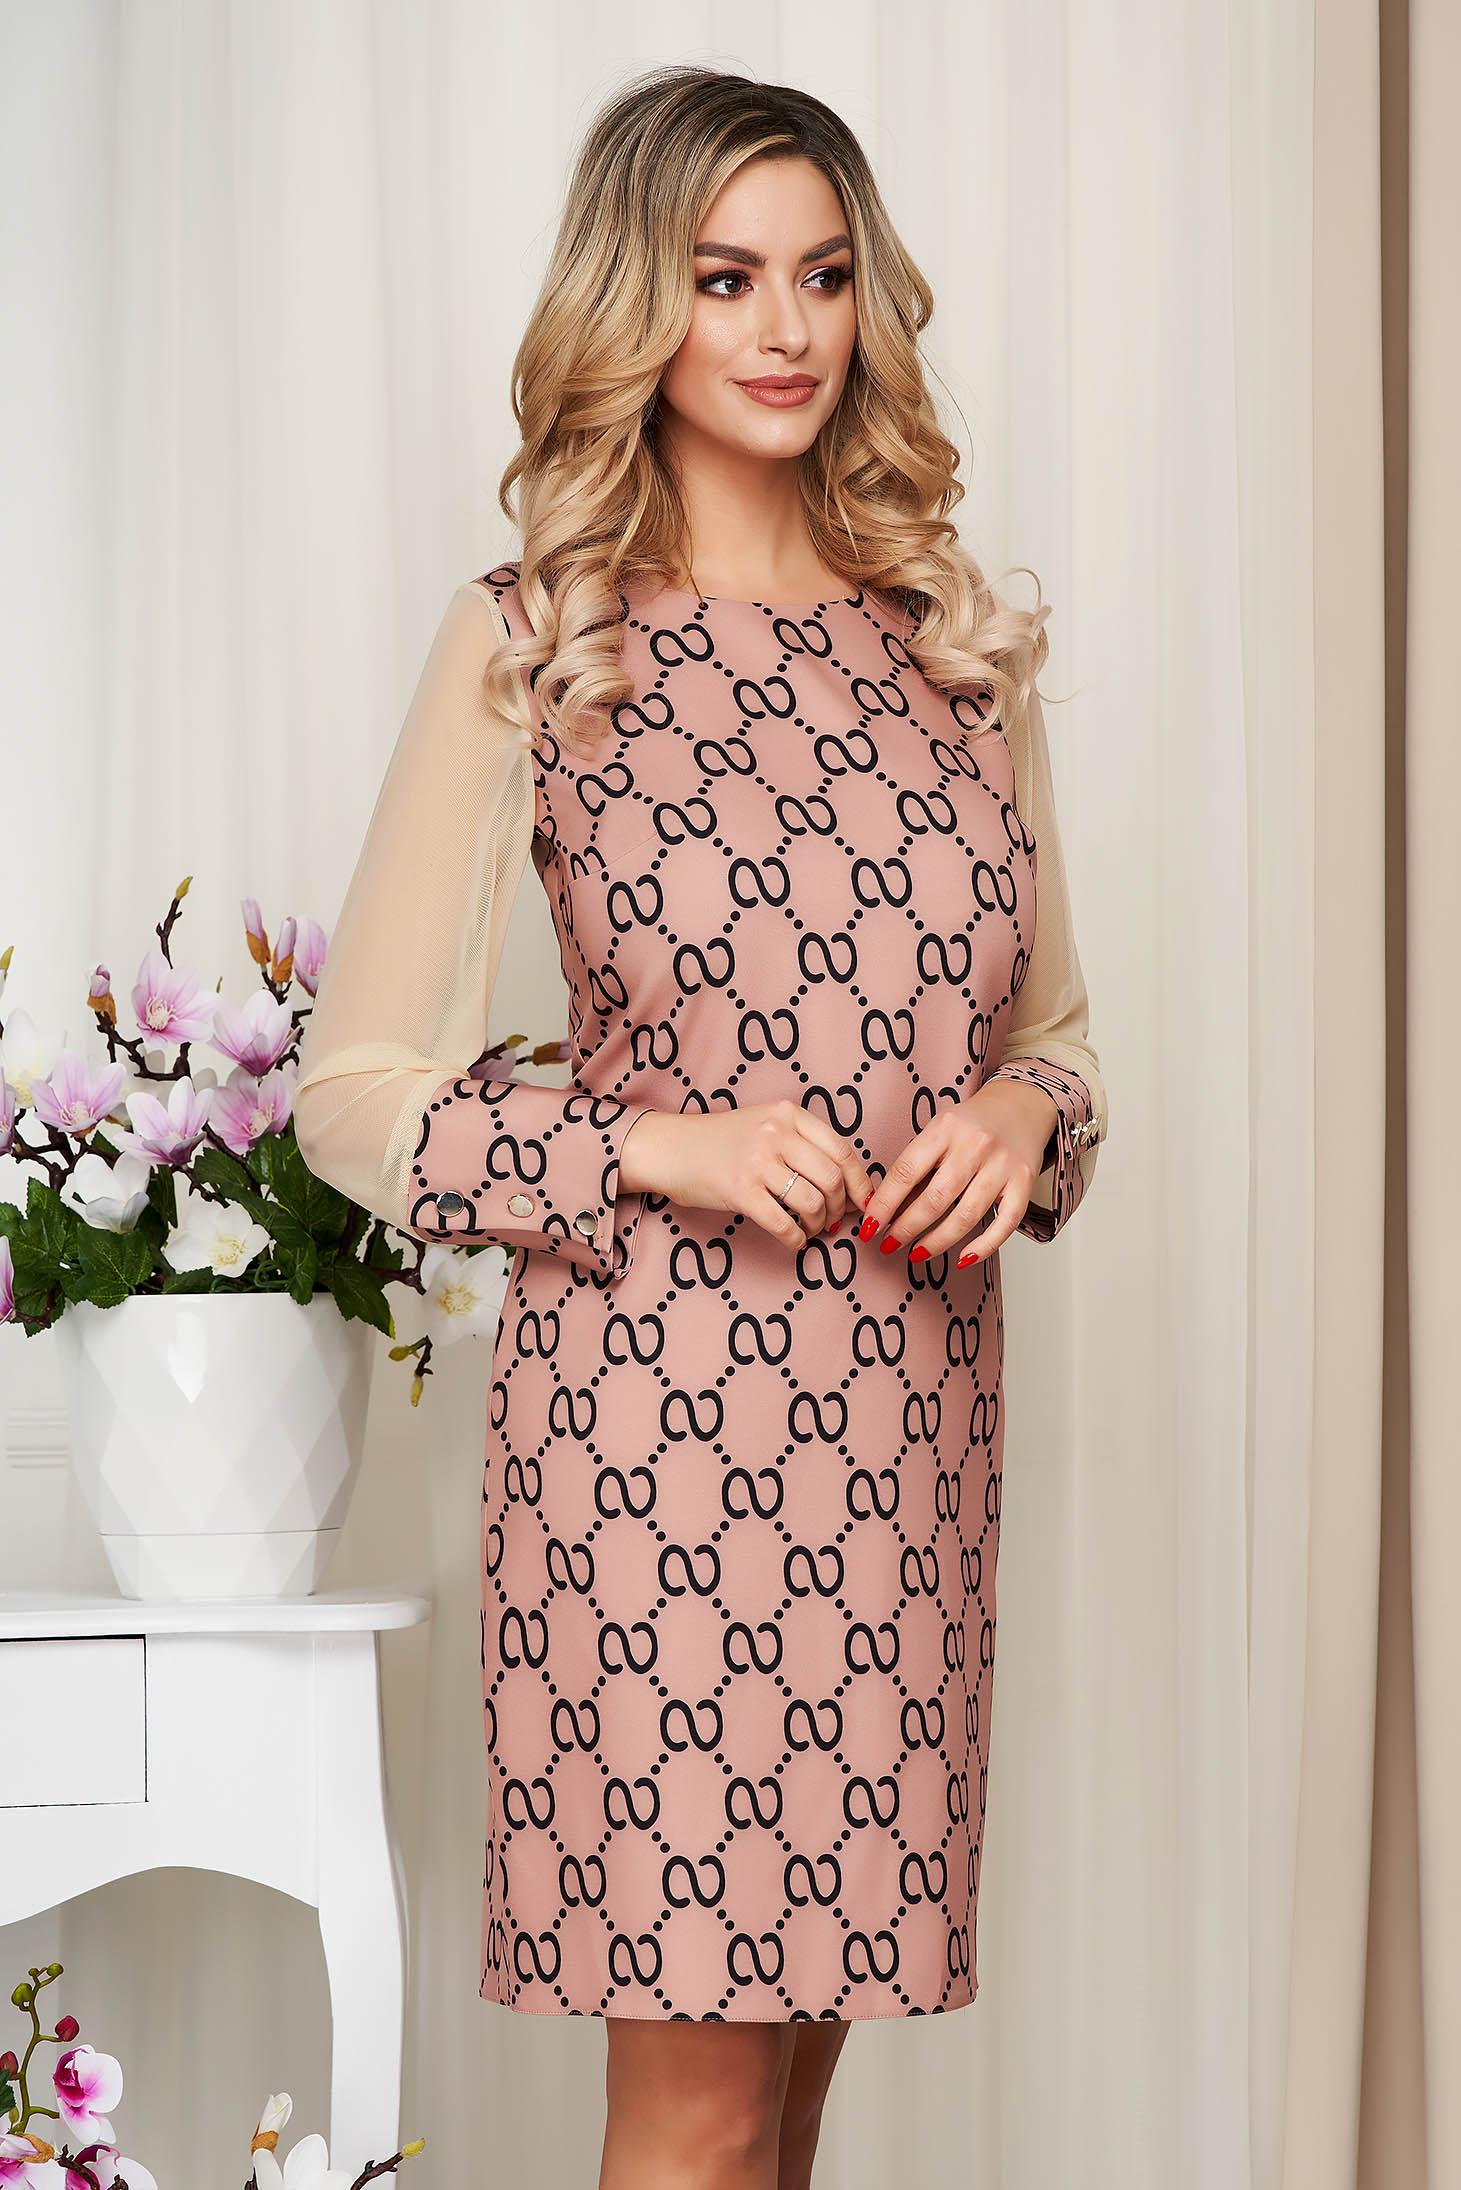 Rochie maro cu imprimeuri grafice office cu un croi drept si maneci transparente